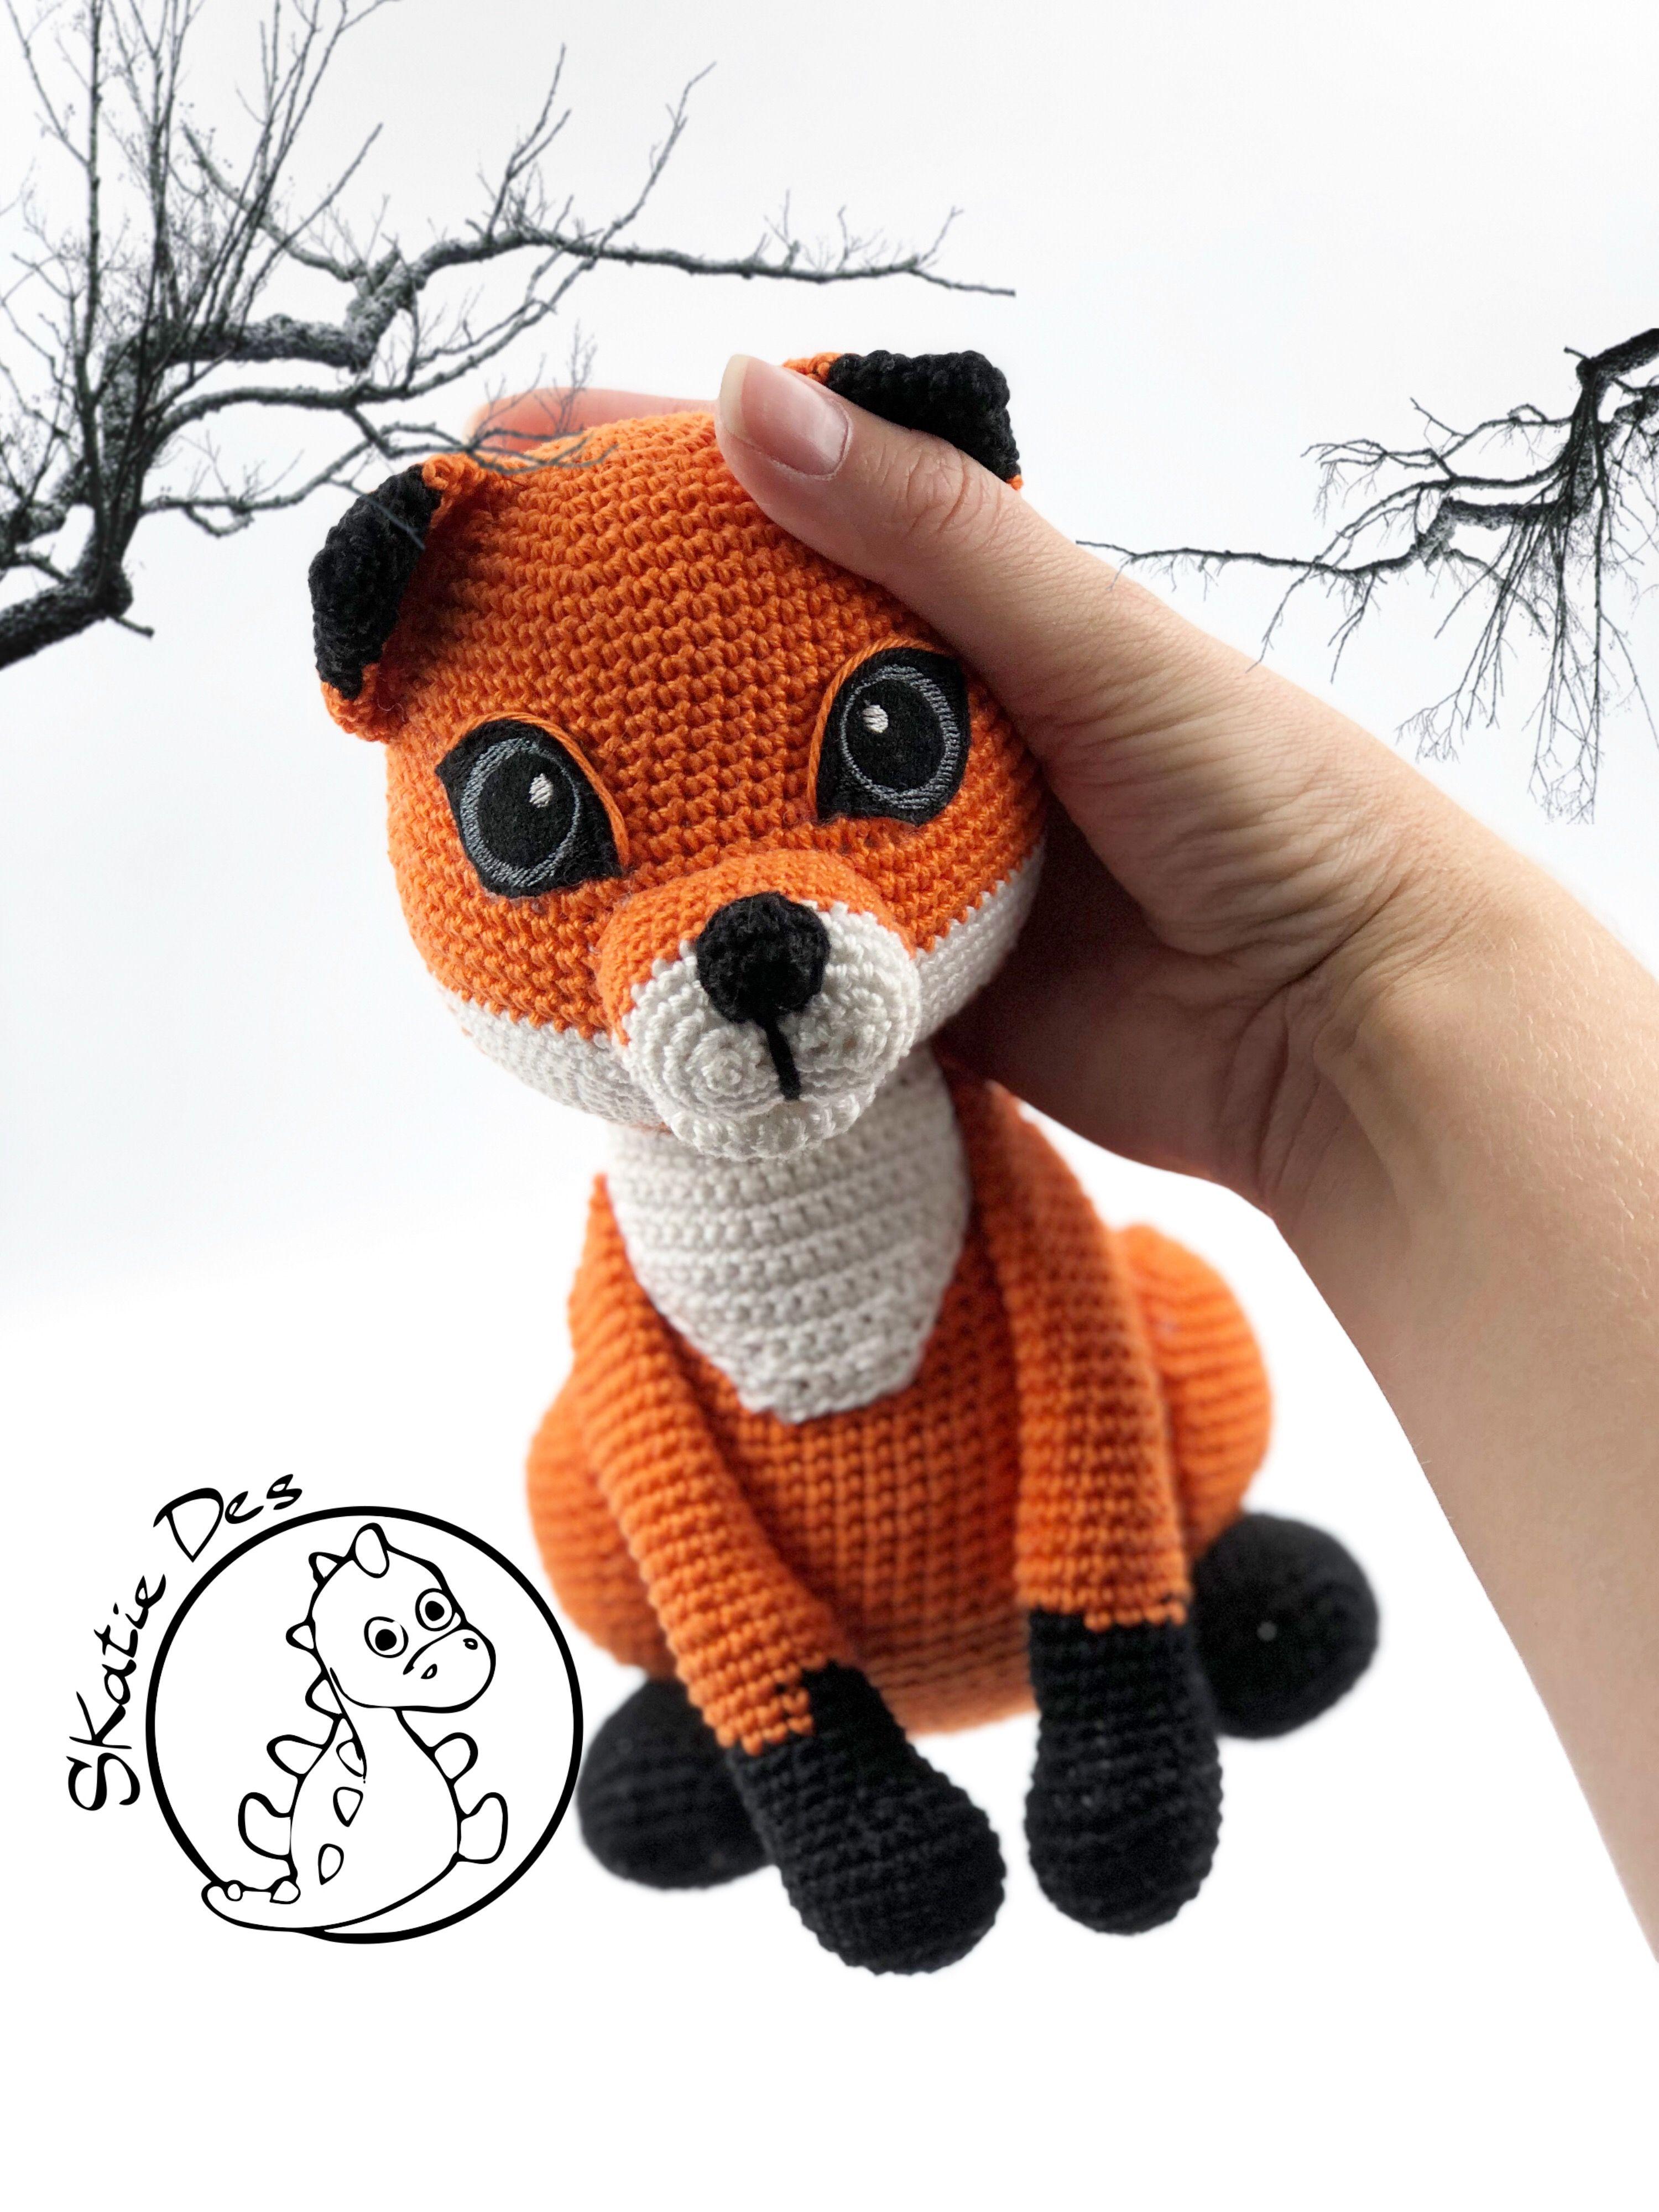 Adorable crochet Fox Felix according to my pattern